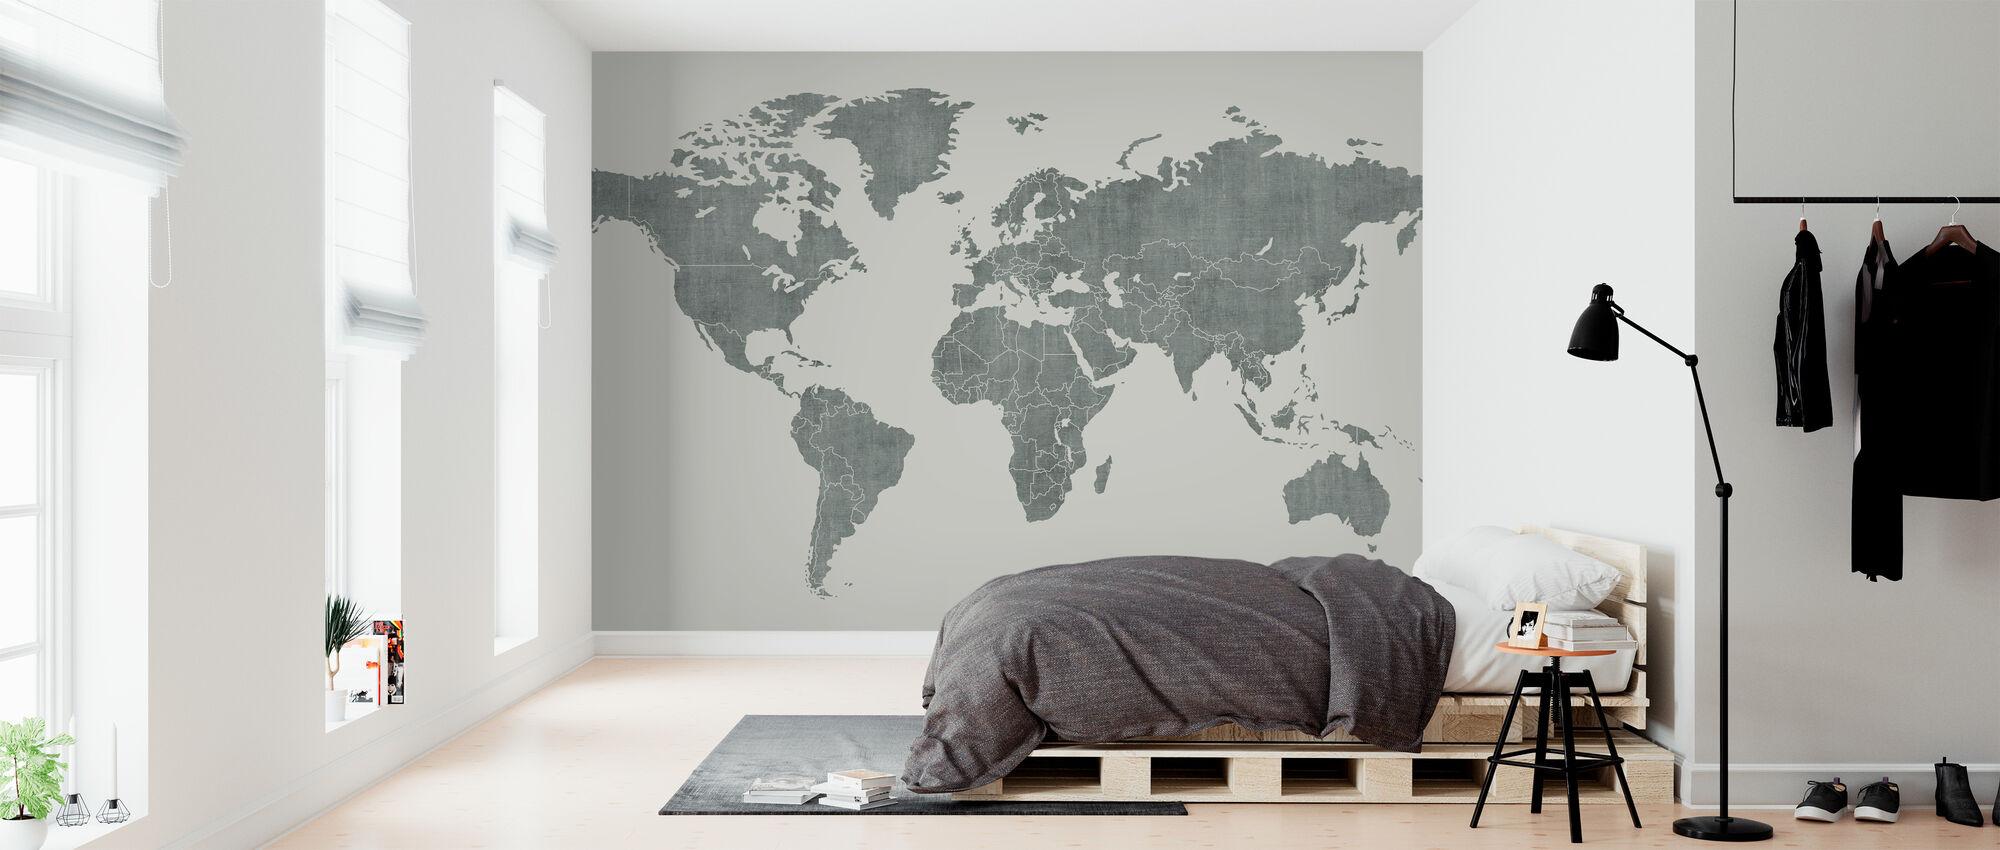 Voguish World Map - Green - Wallpaper - Bedroom